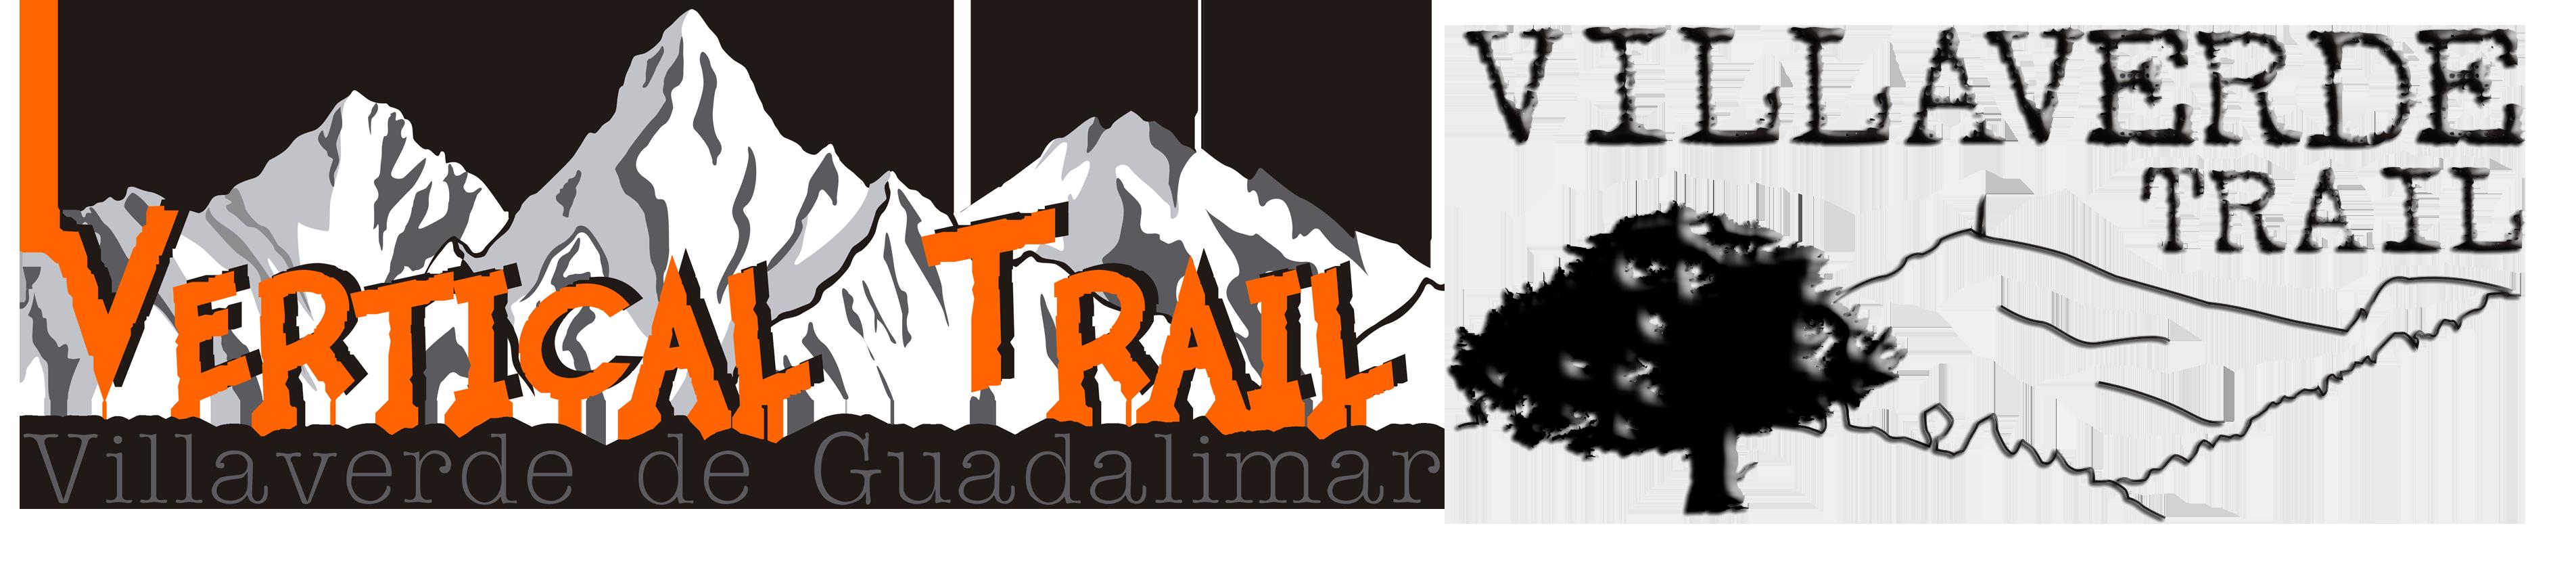 Vertical Trail Pico la Sarga